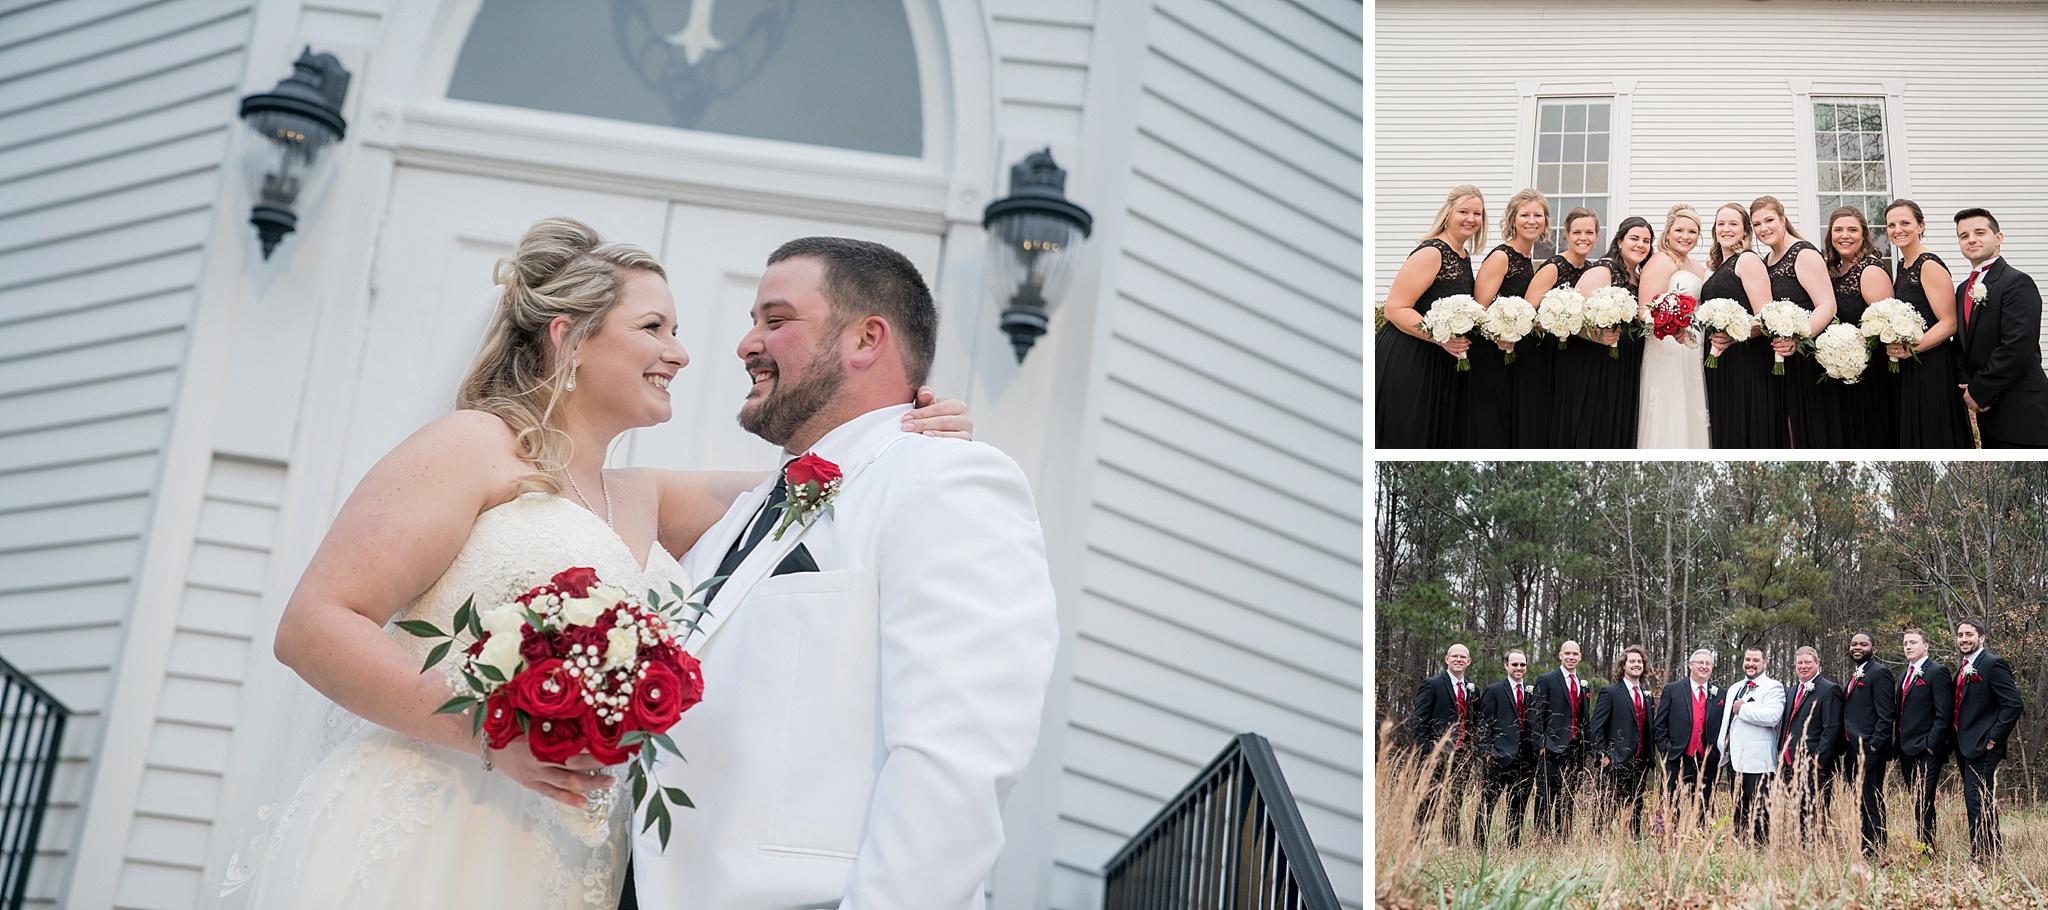 Raleigh-NC-Wedding-Photographers-107.jpg